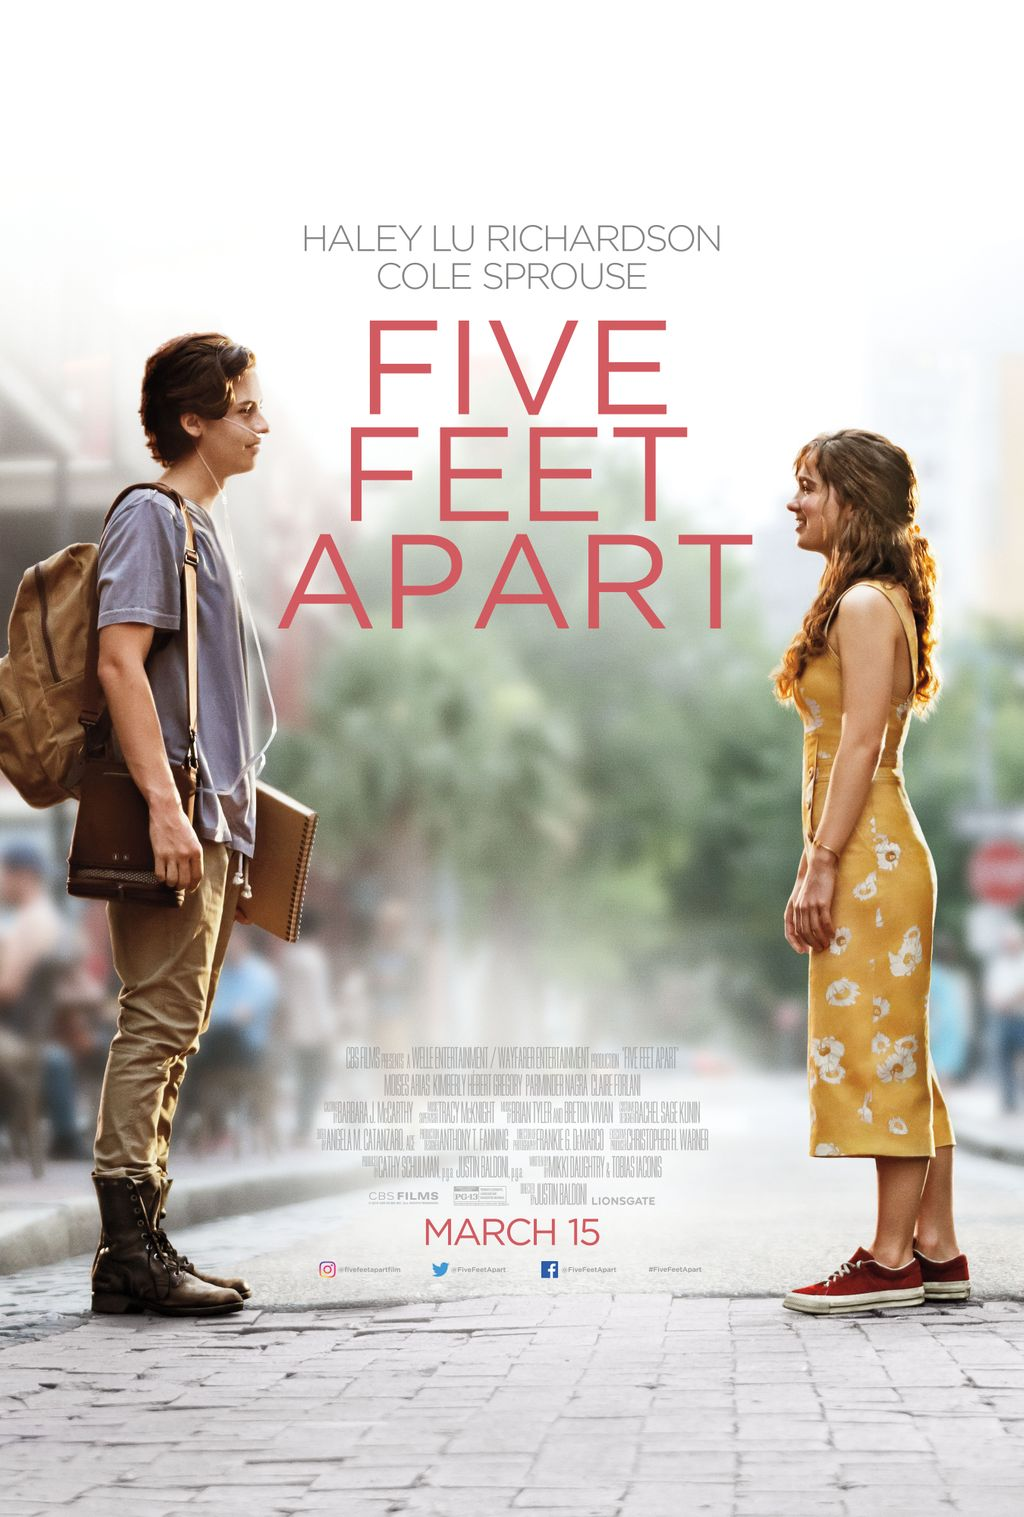 @fivefeetapart